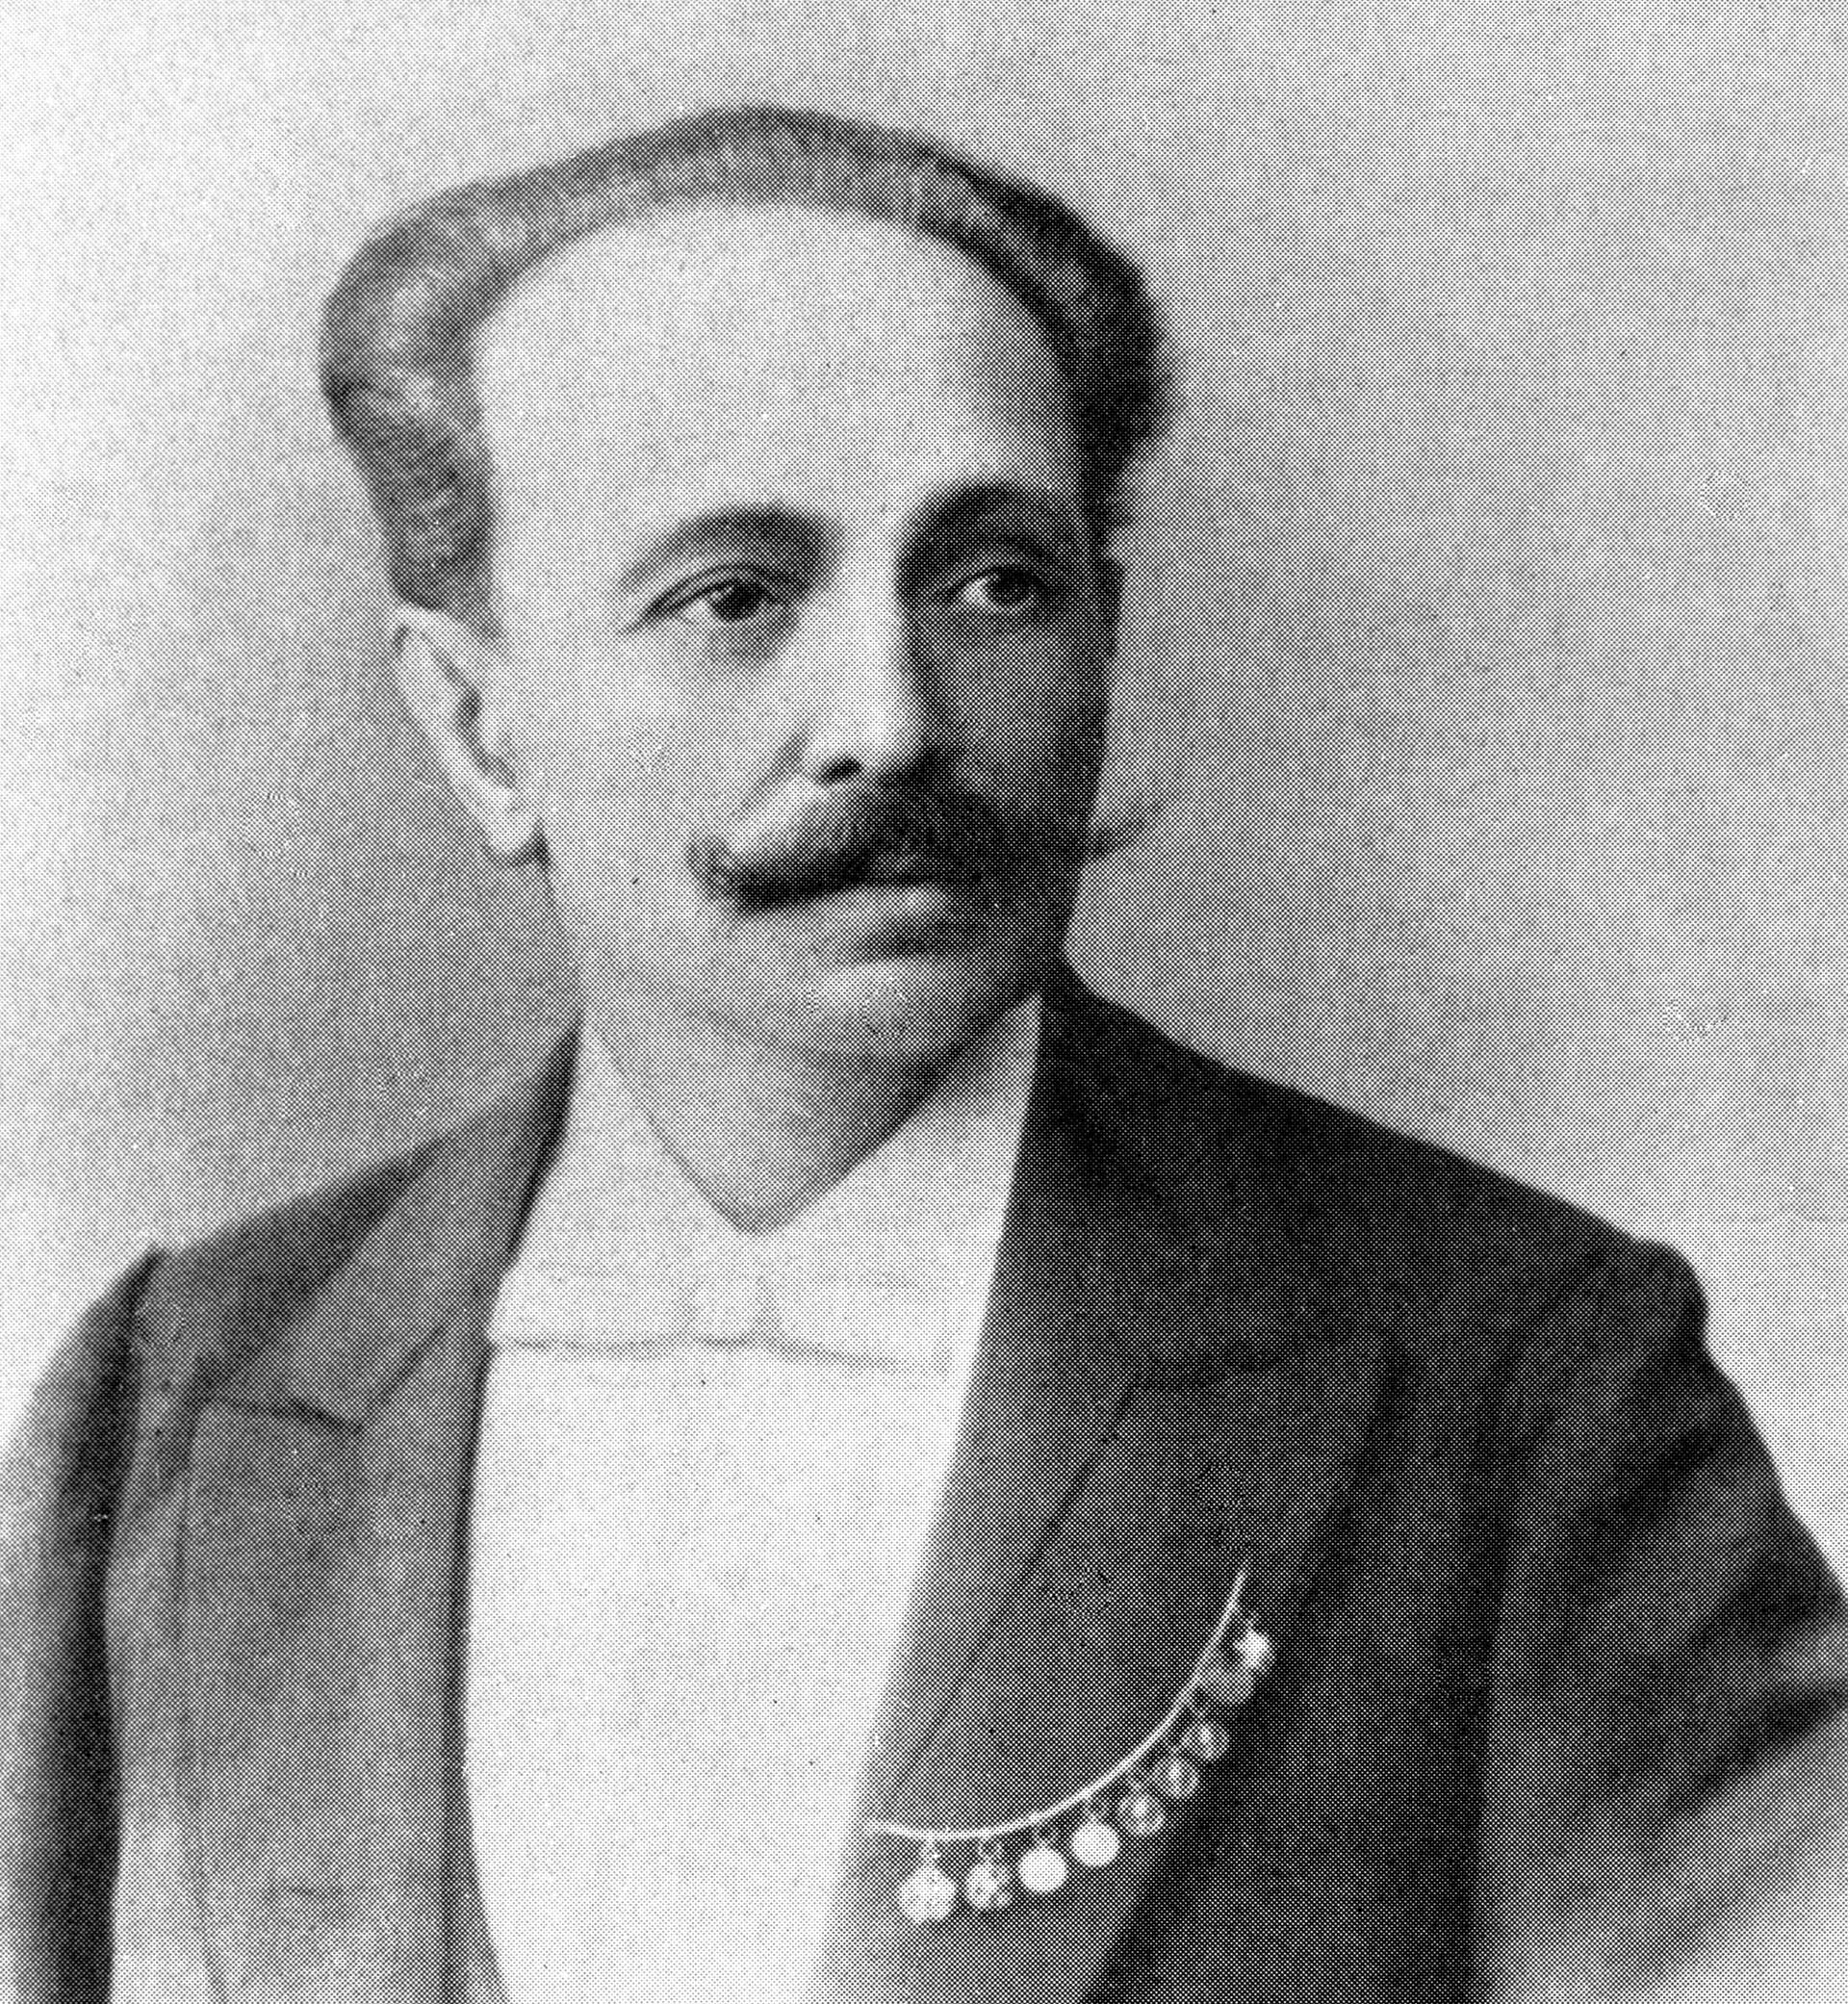 Russian artist, ballet master Marius Petipa, 1878.